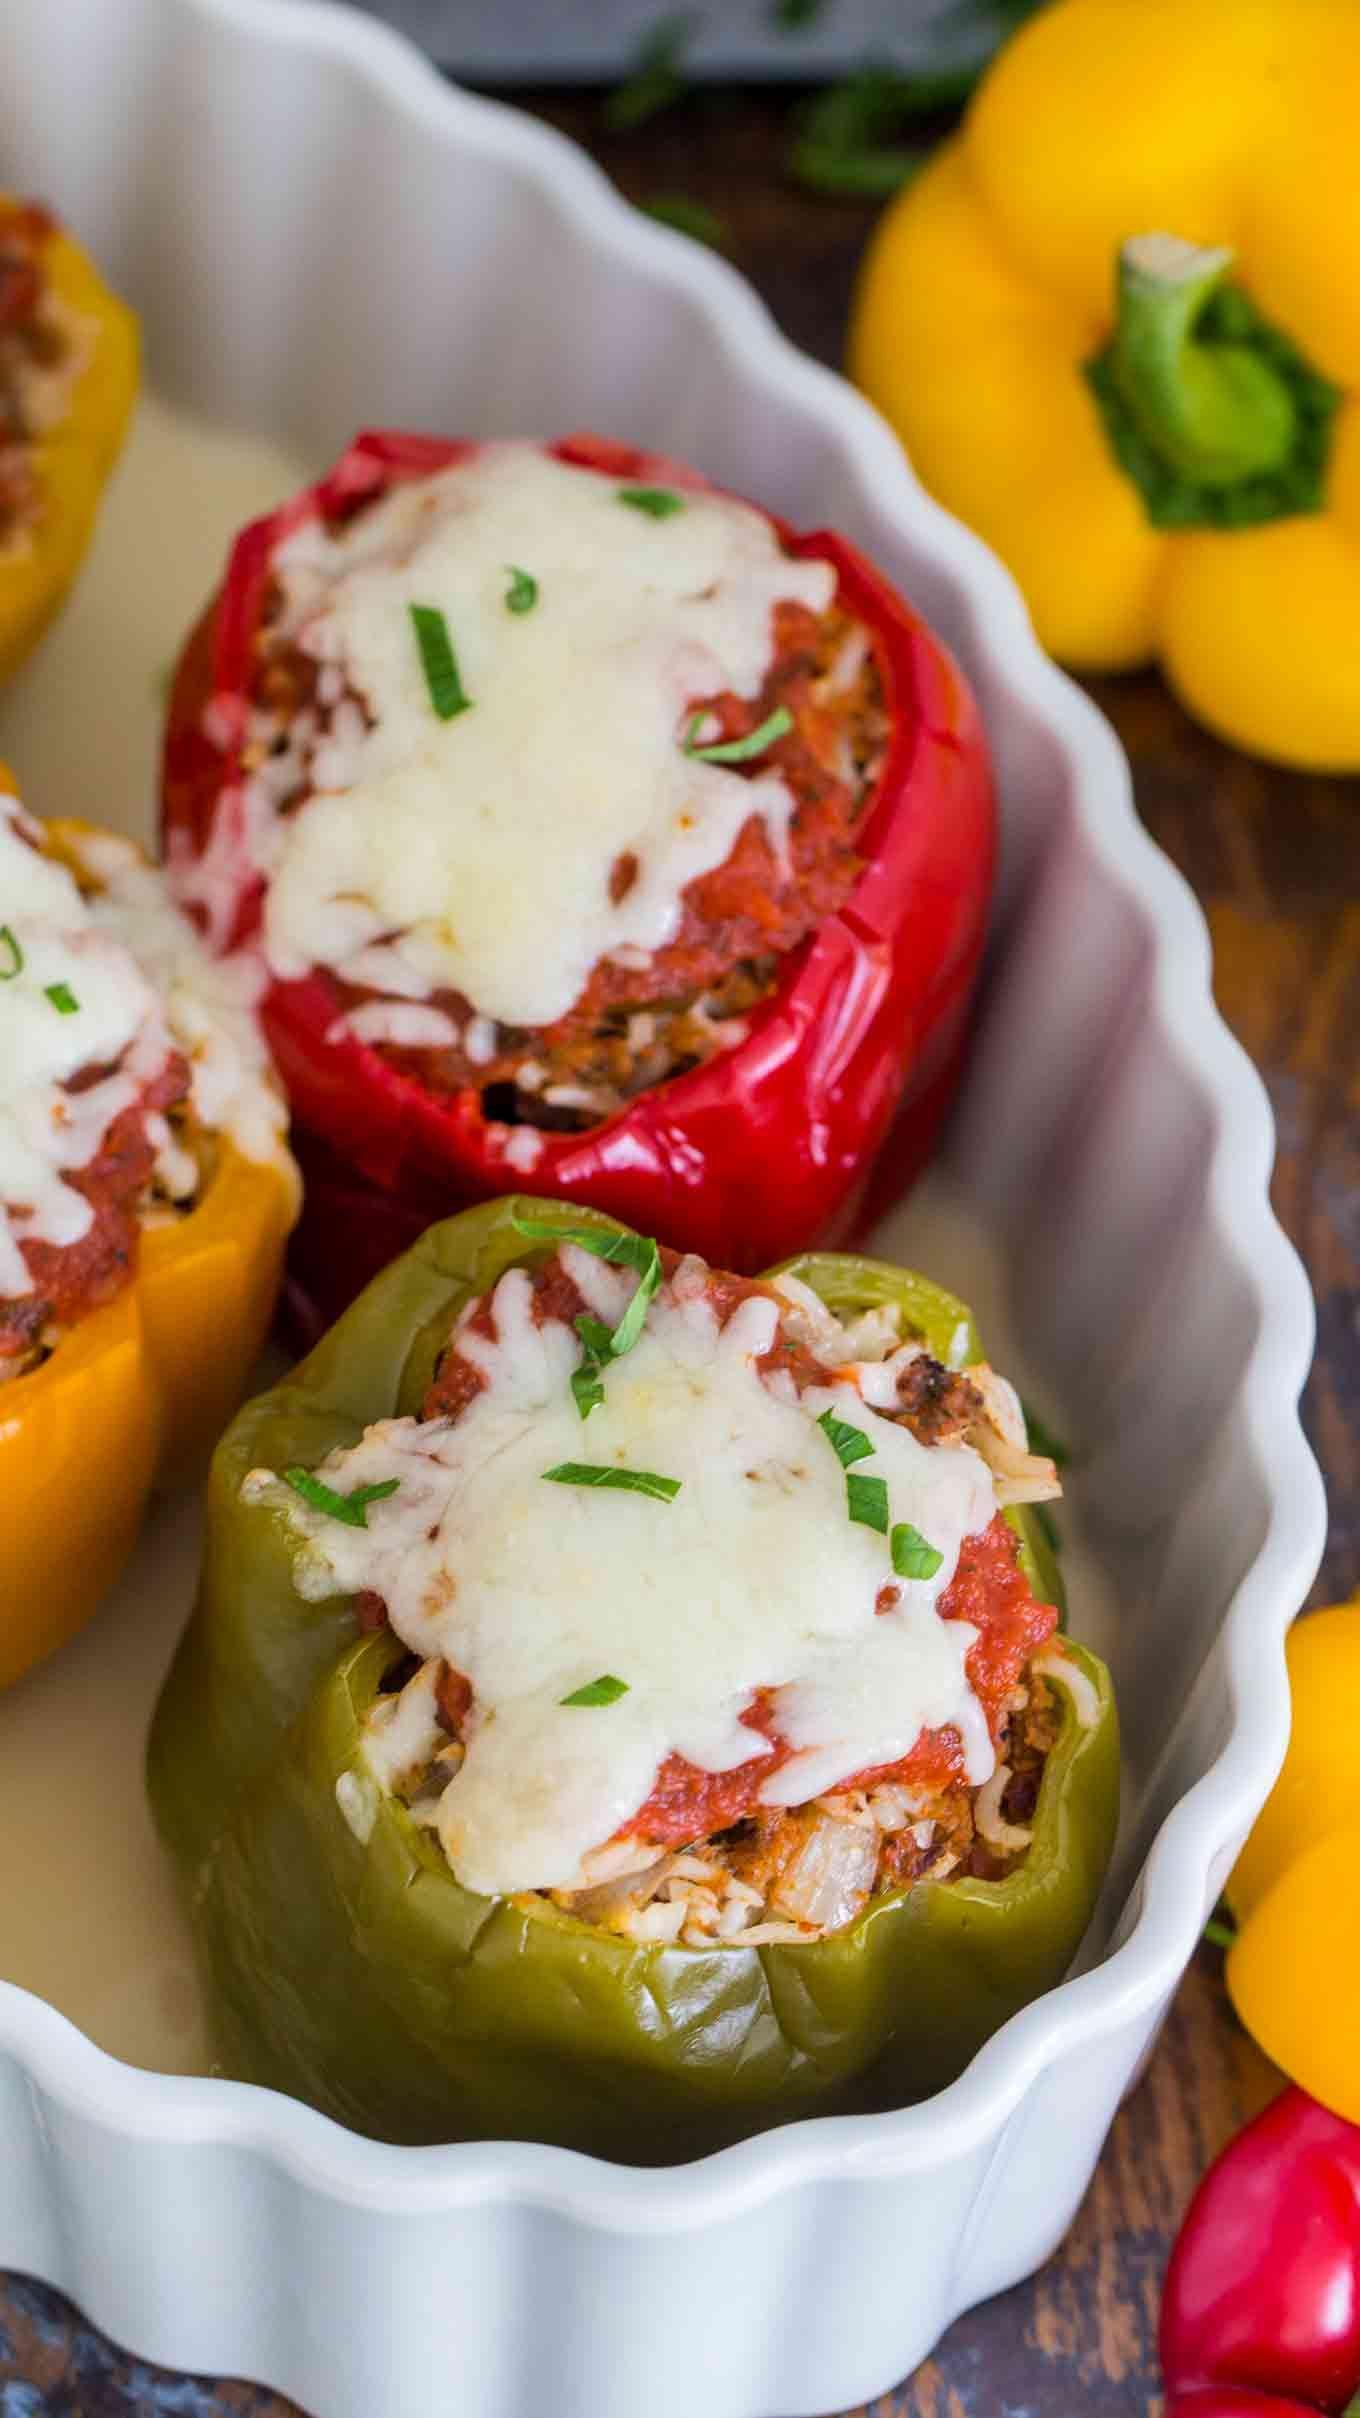 Best Instant Pot Stuffed Peppers Video Sweet And Savory Meals Recipe Stuffed Peppers Instant Pot Recipes Easy Instant Pot Recipes